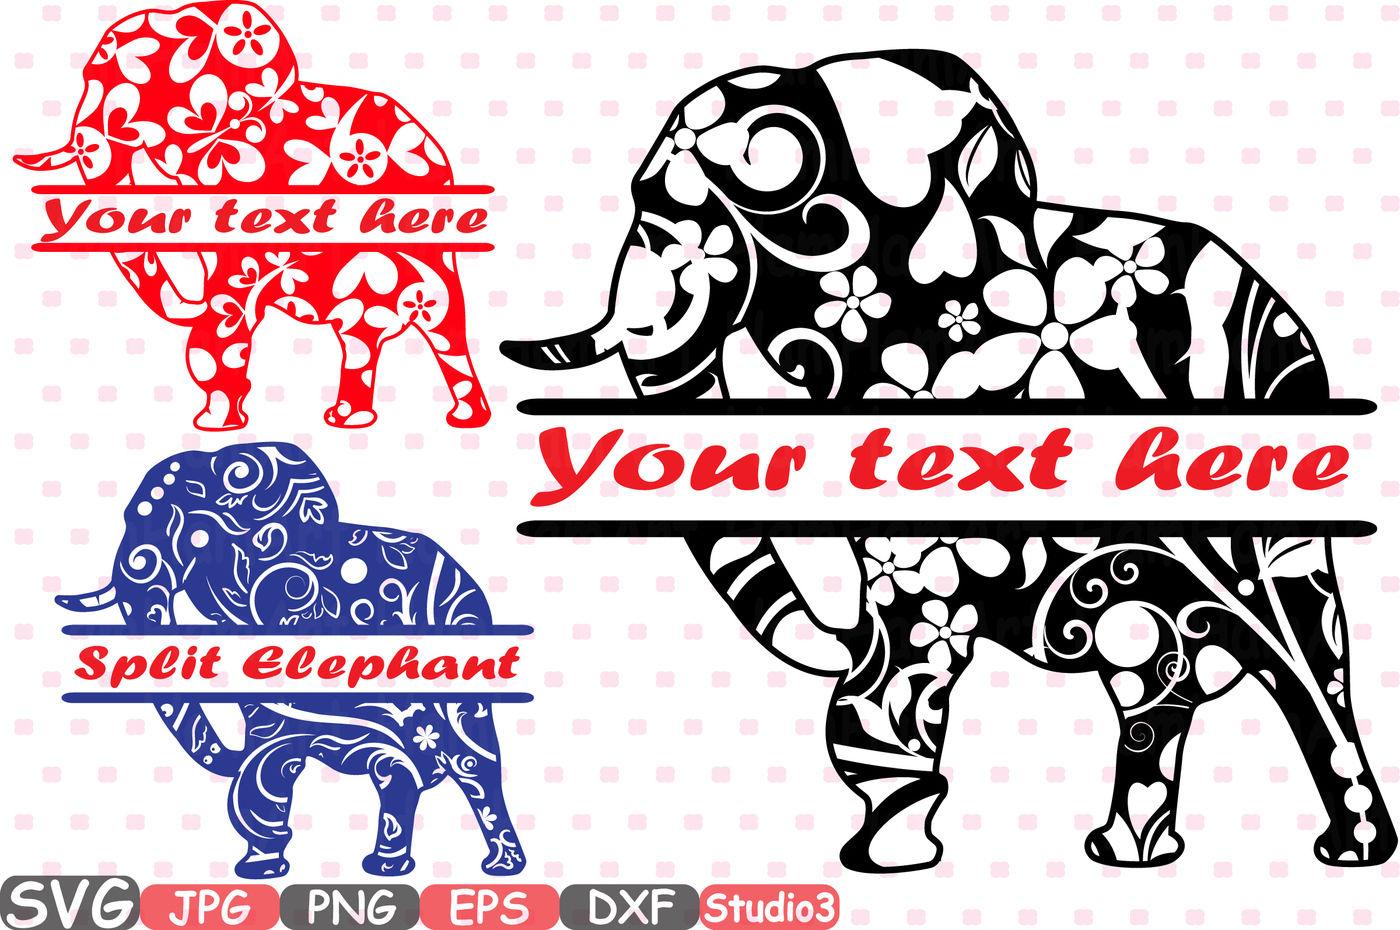 svg files elephant clipart Elephant cut file elephant monogram svg Elephant svg file Elephant bundle cutting file elephant png